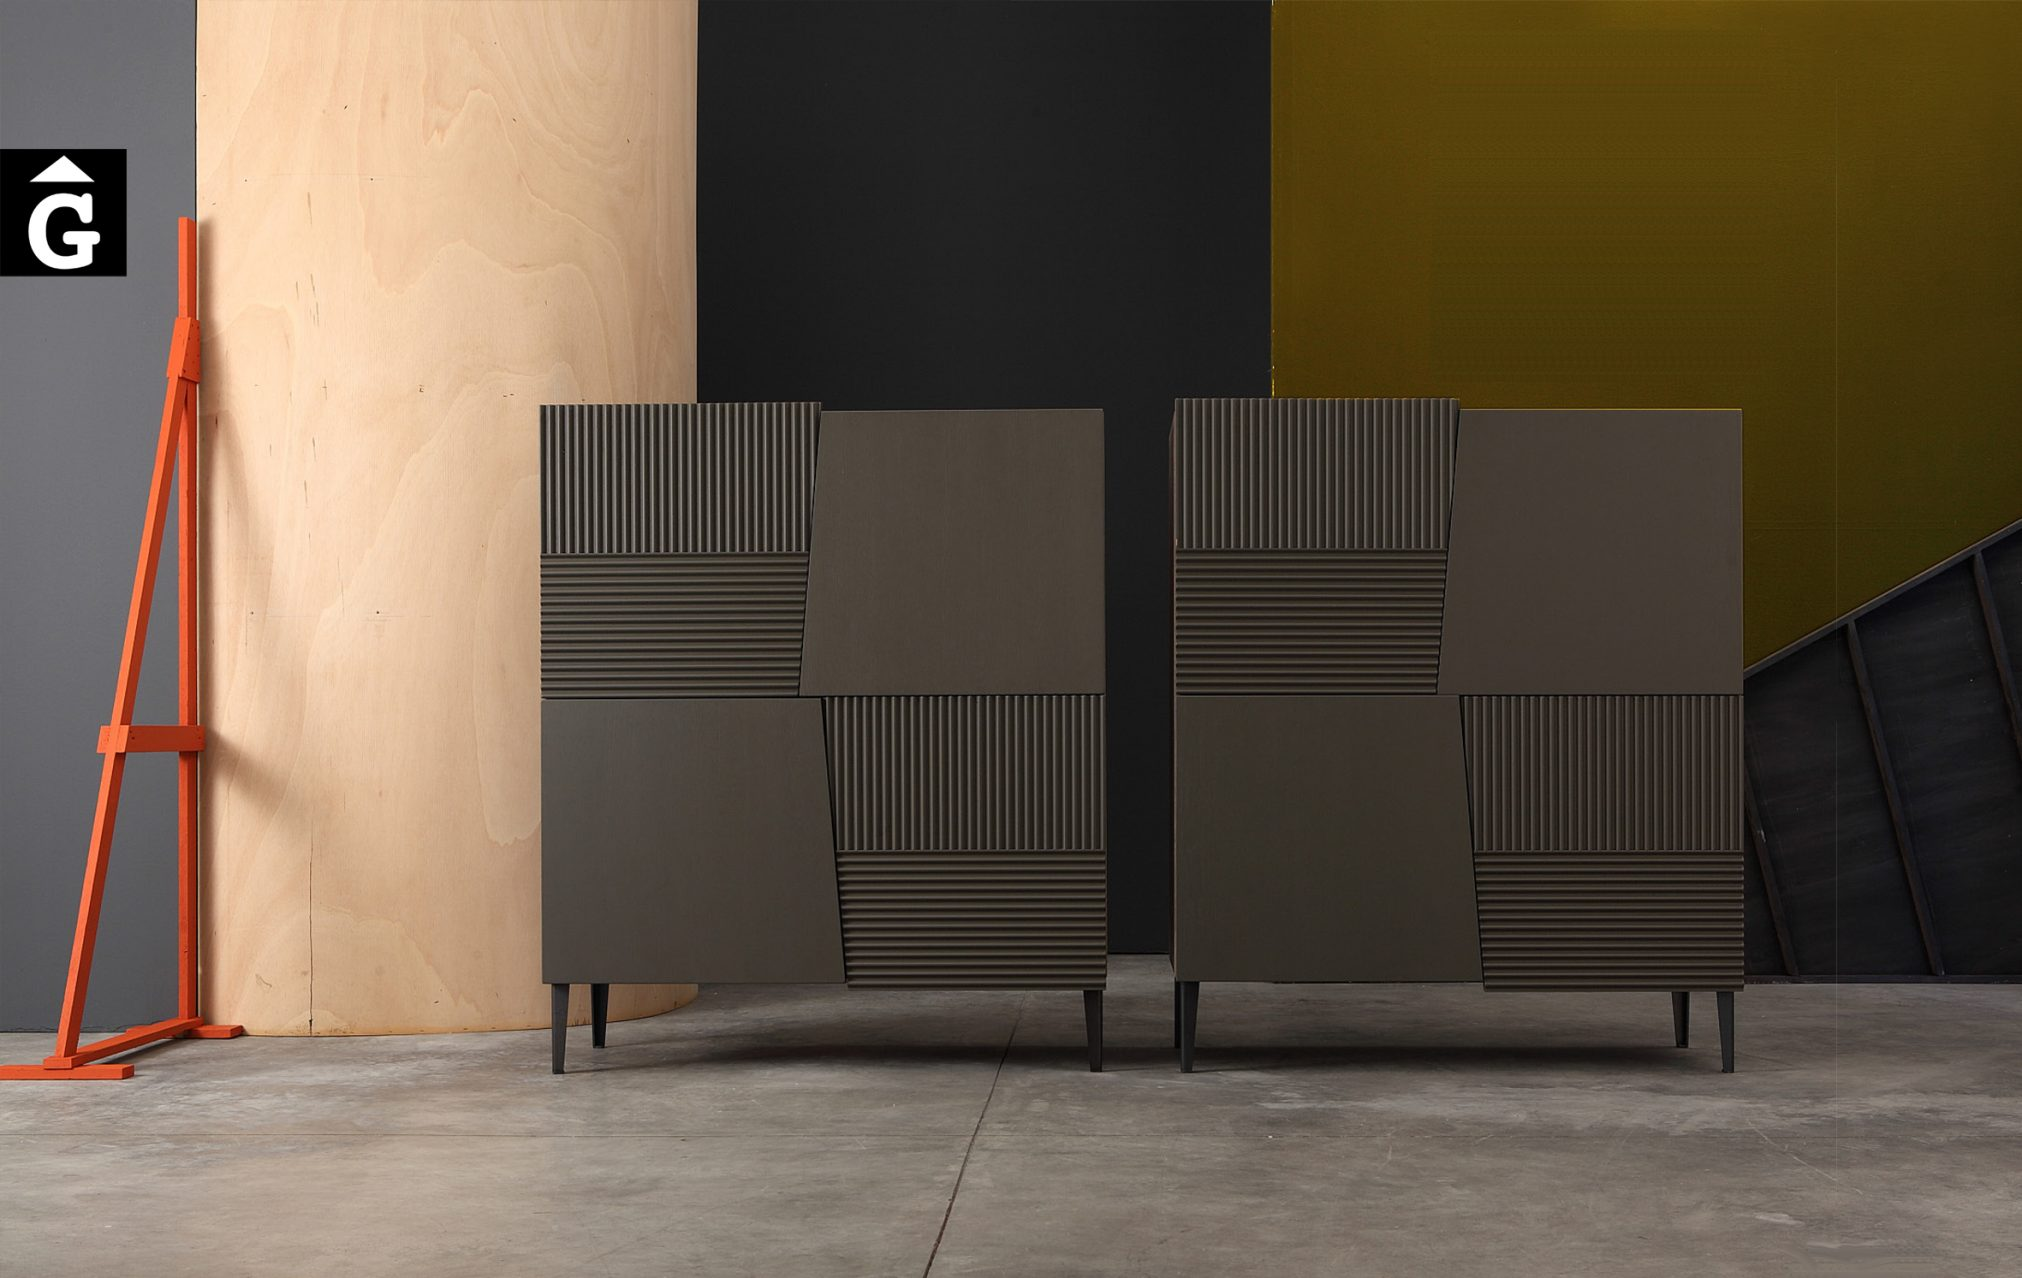 Devina Nais 7 Twins Container by Mobles GIFREU Girona modern qualitat vanguardia minim elegant atemporal